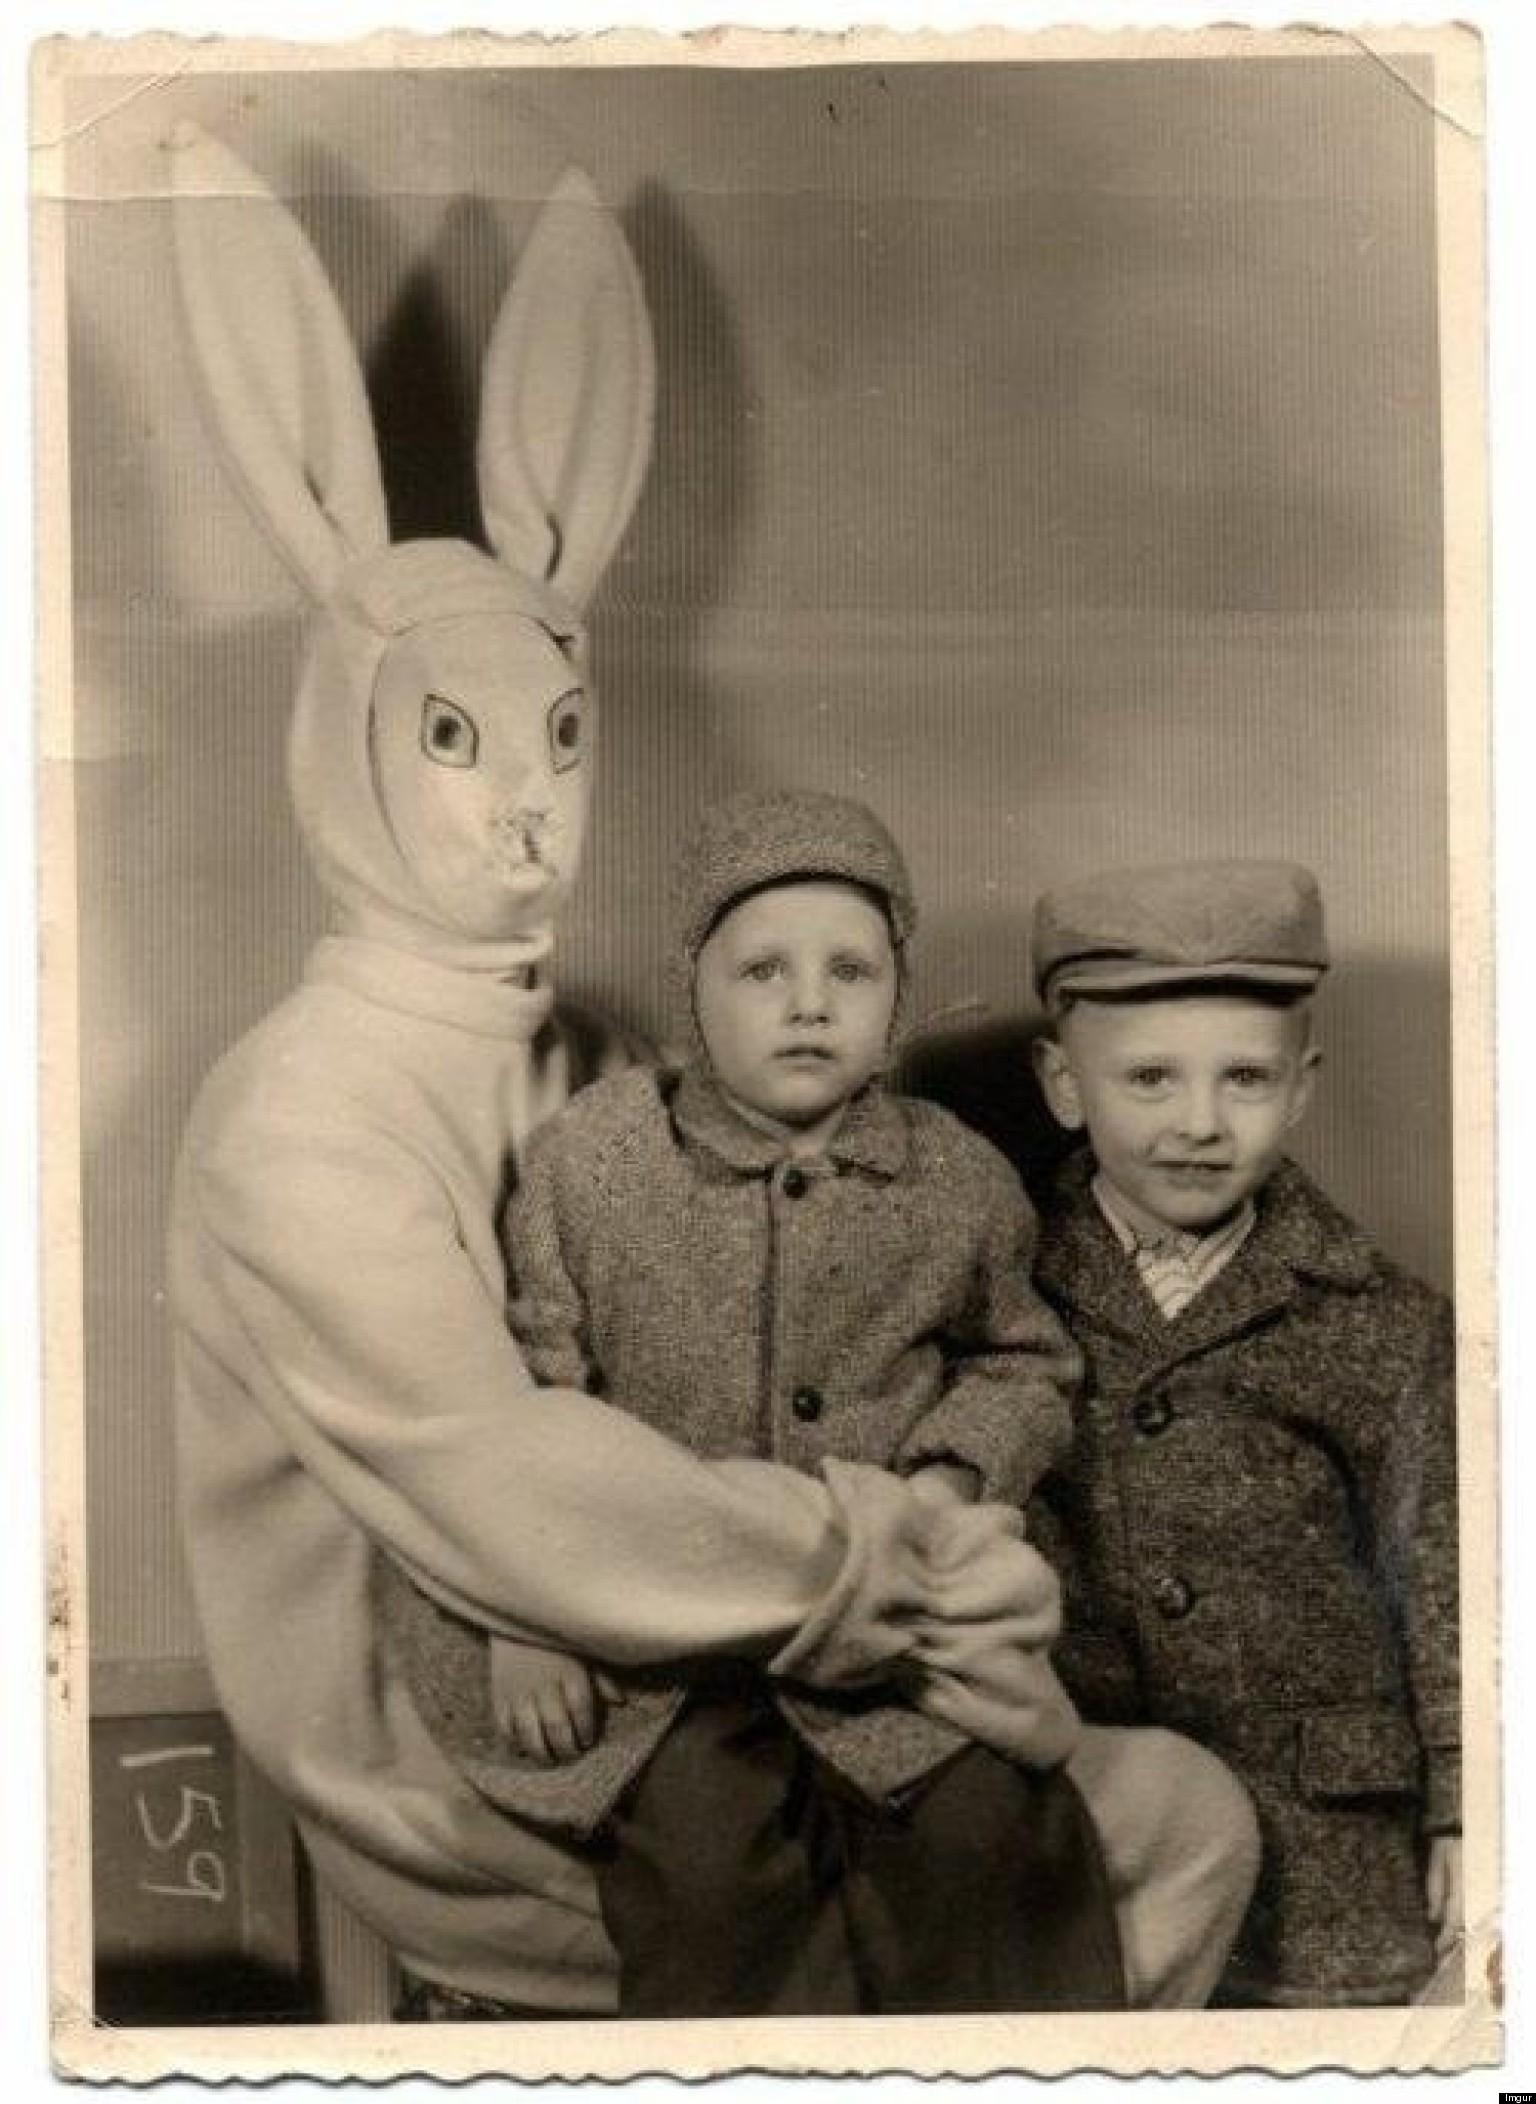 Scary Easter Bunny Photos O-creepy-vintage-easter-bunny- ...